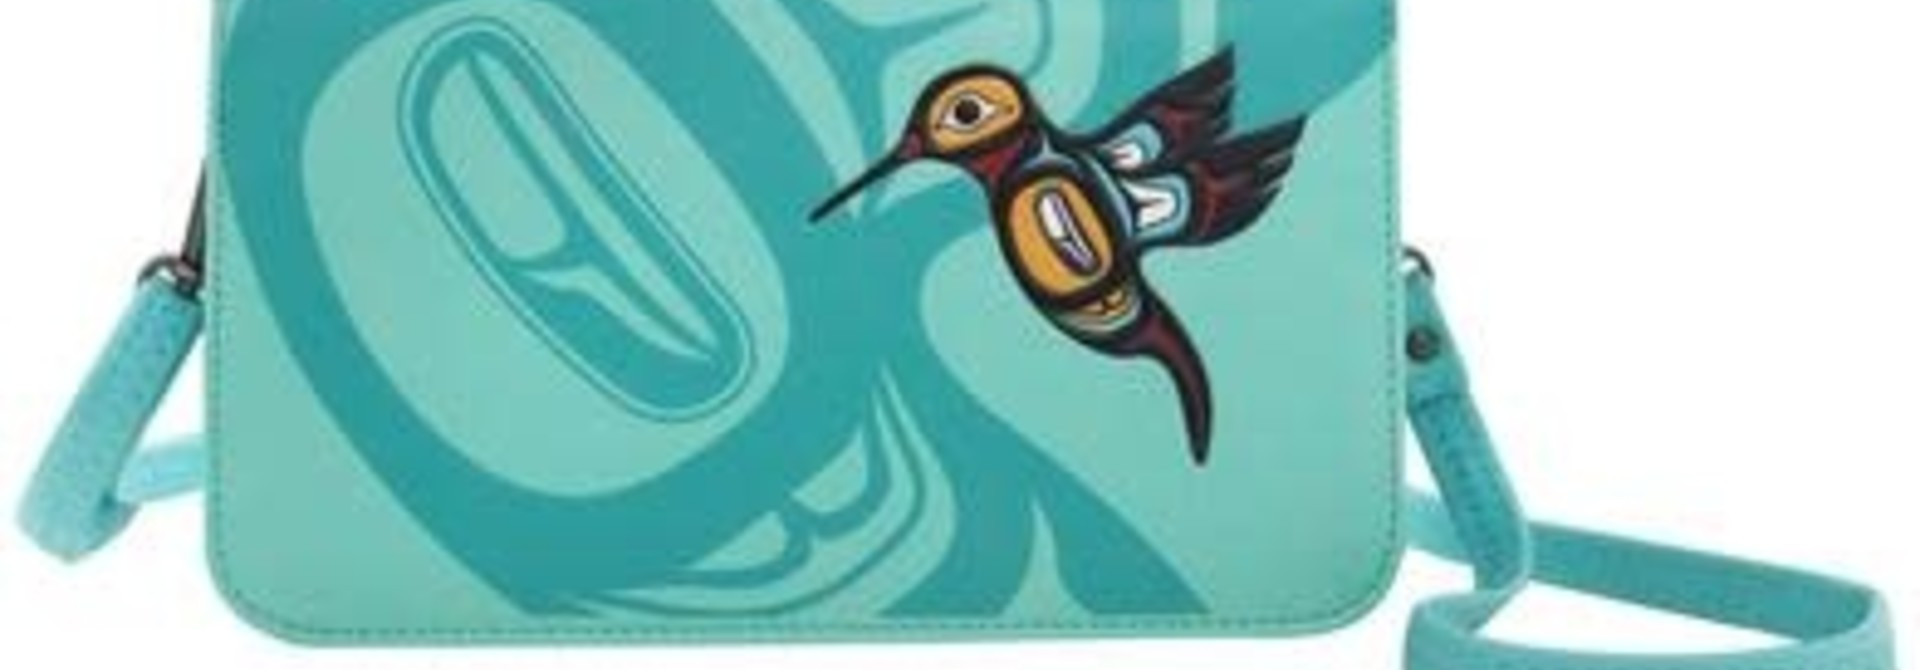 Cross Body Purse -Hummingbird design